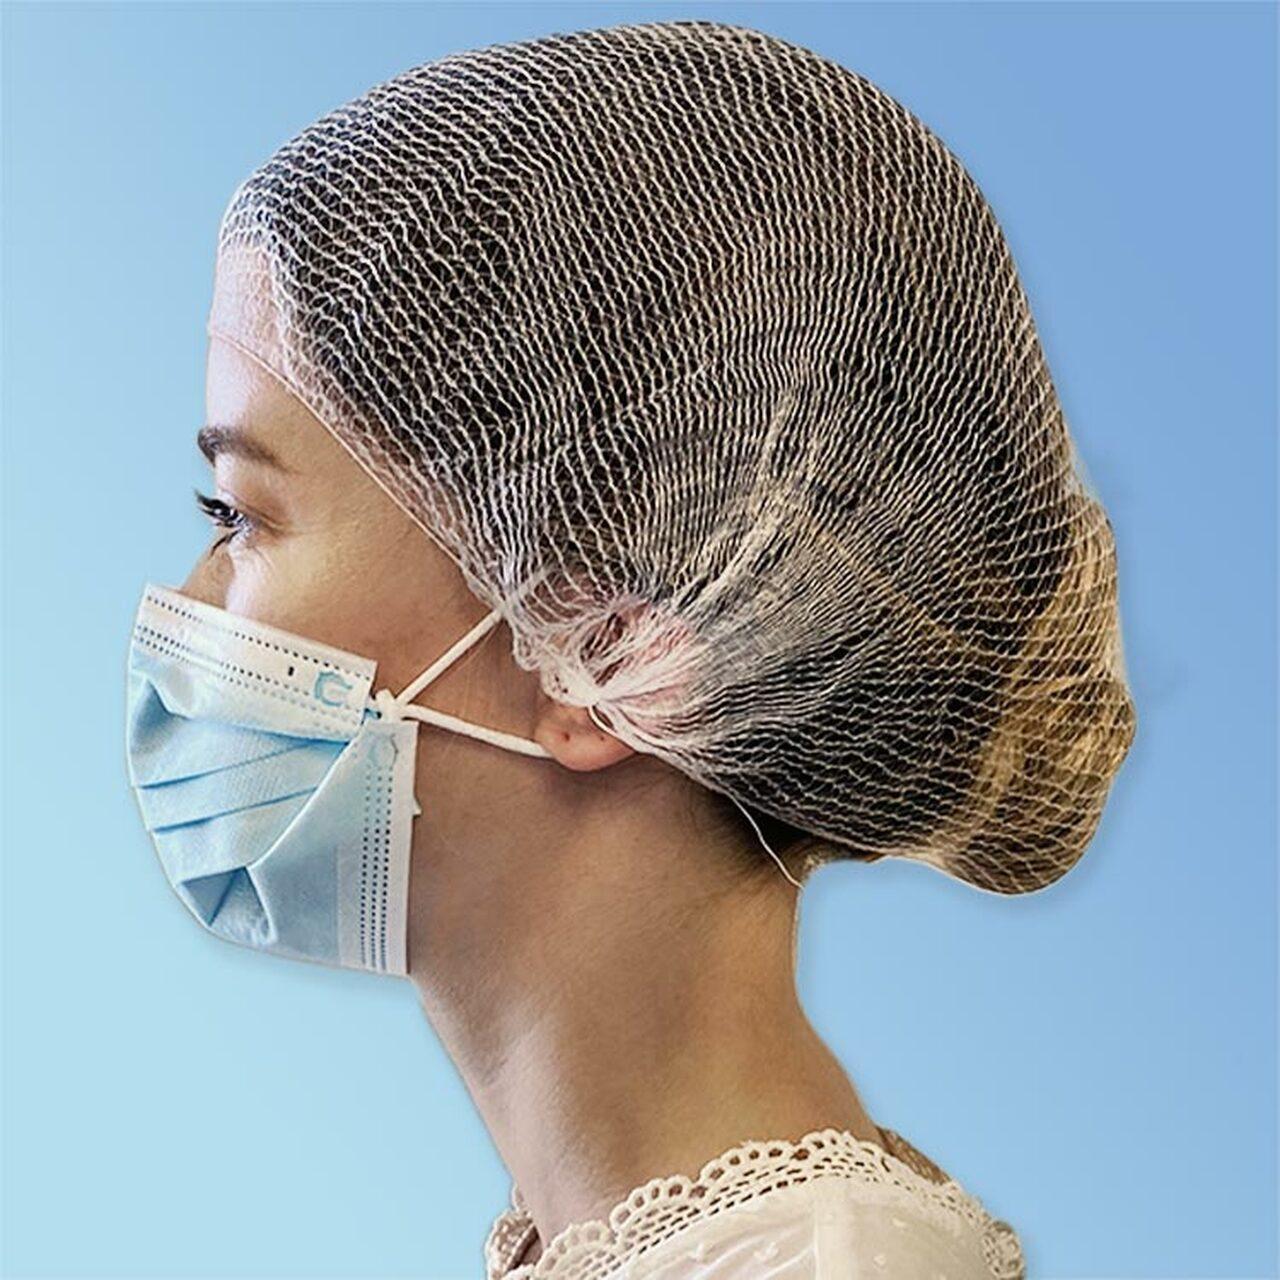 honeycomb hair nets